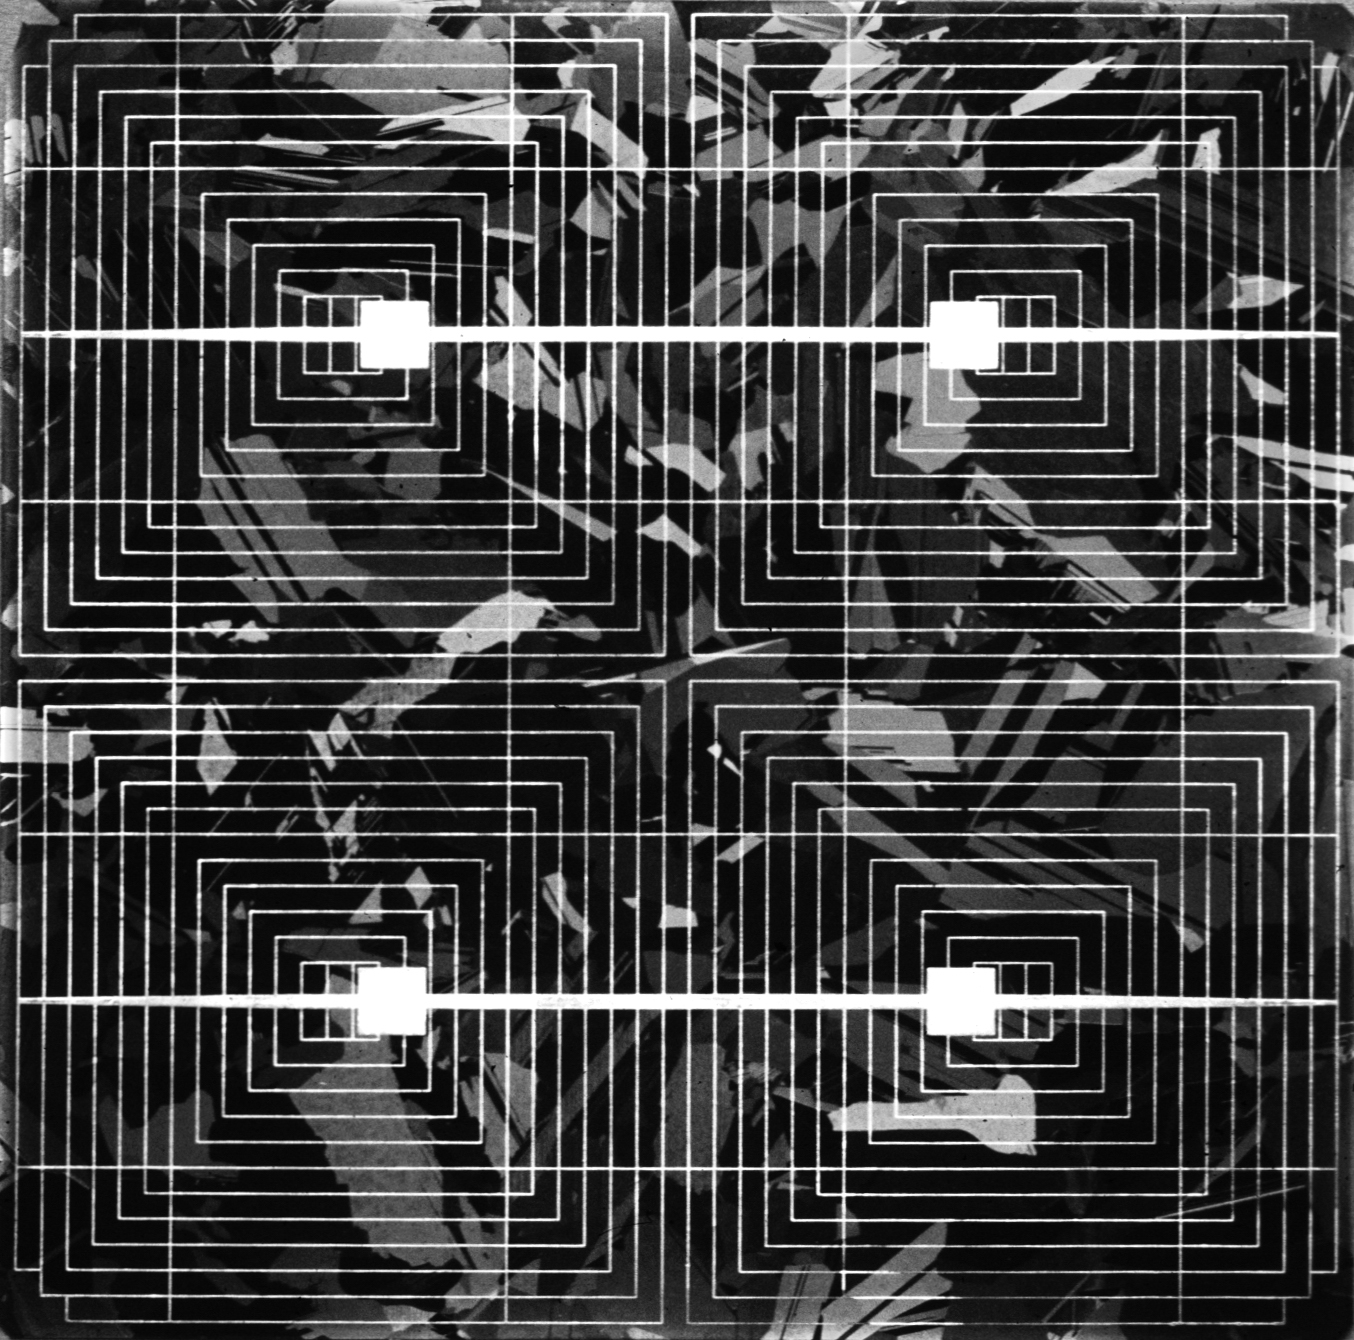 daniel_hausig_boxenstop_2000_light-art-installation